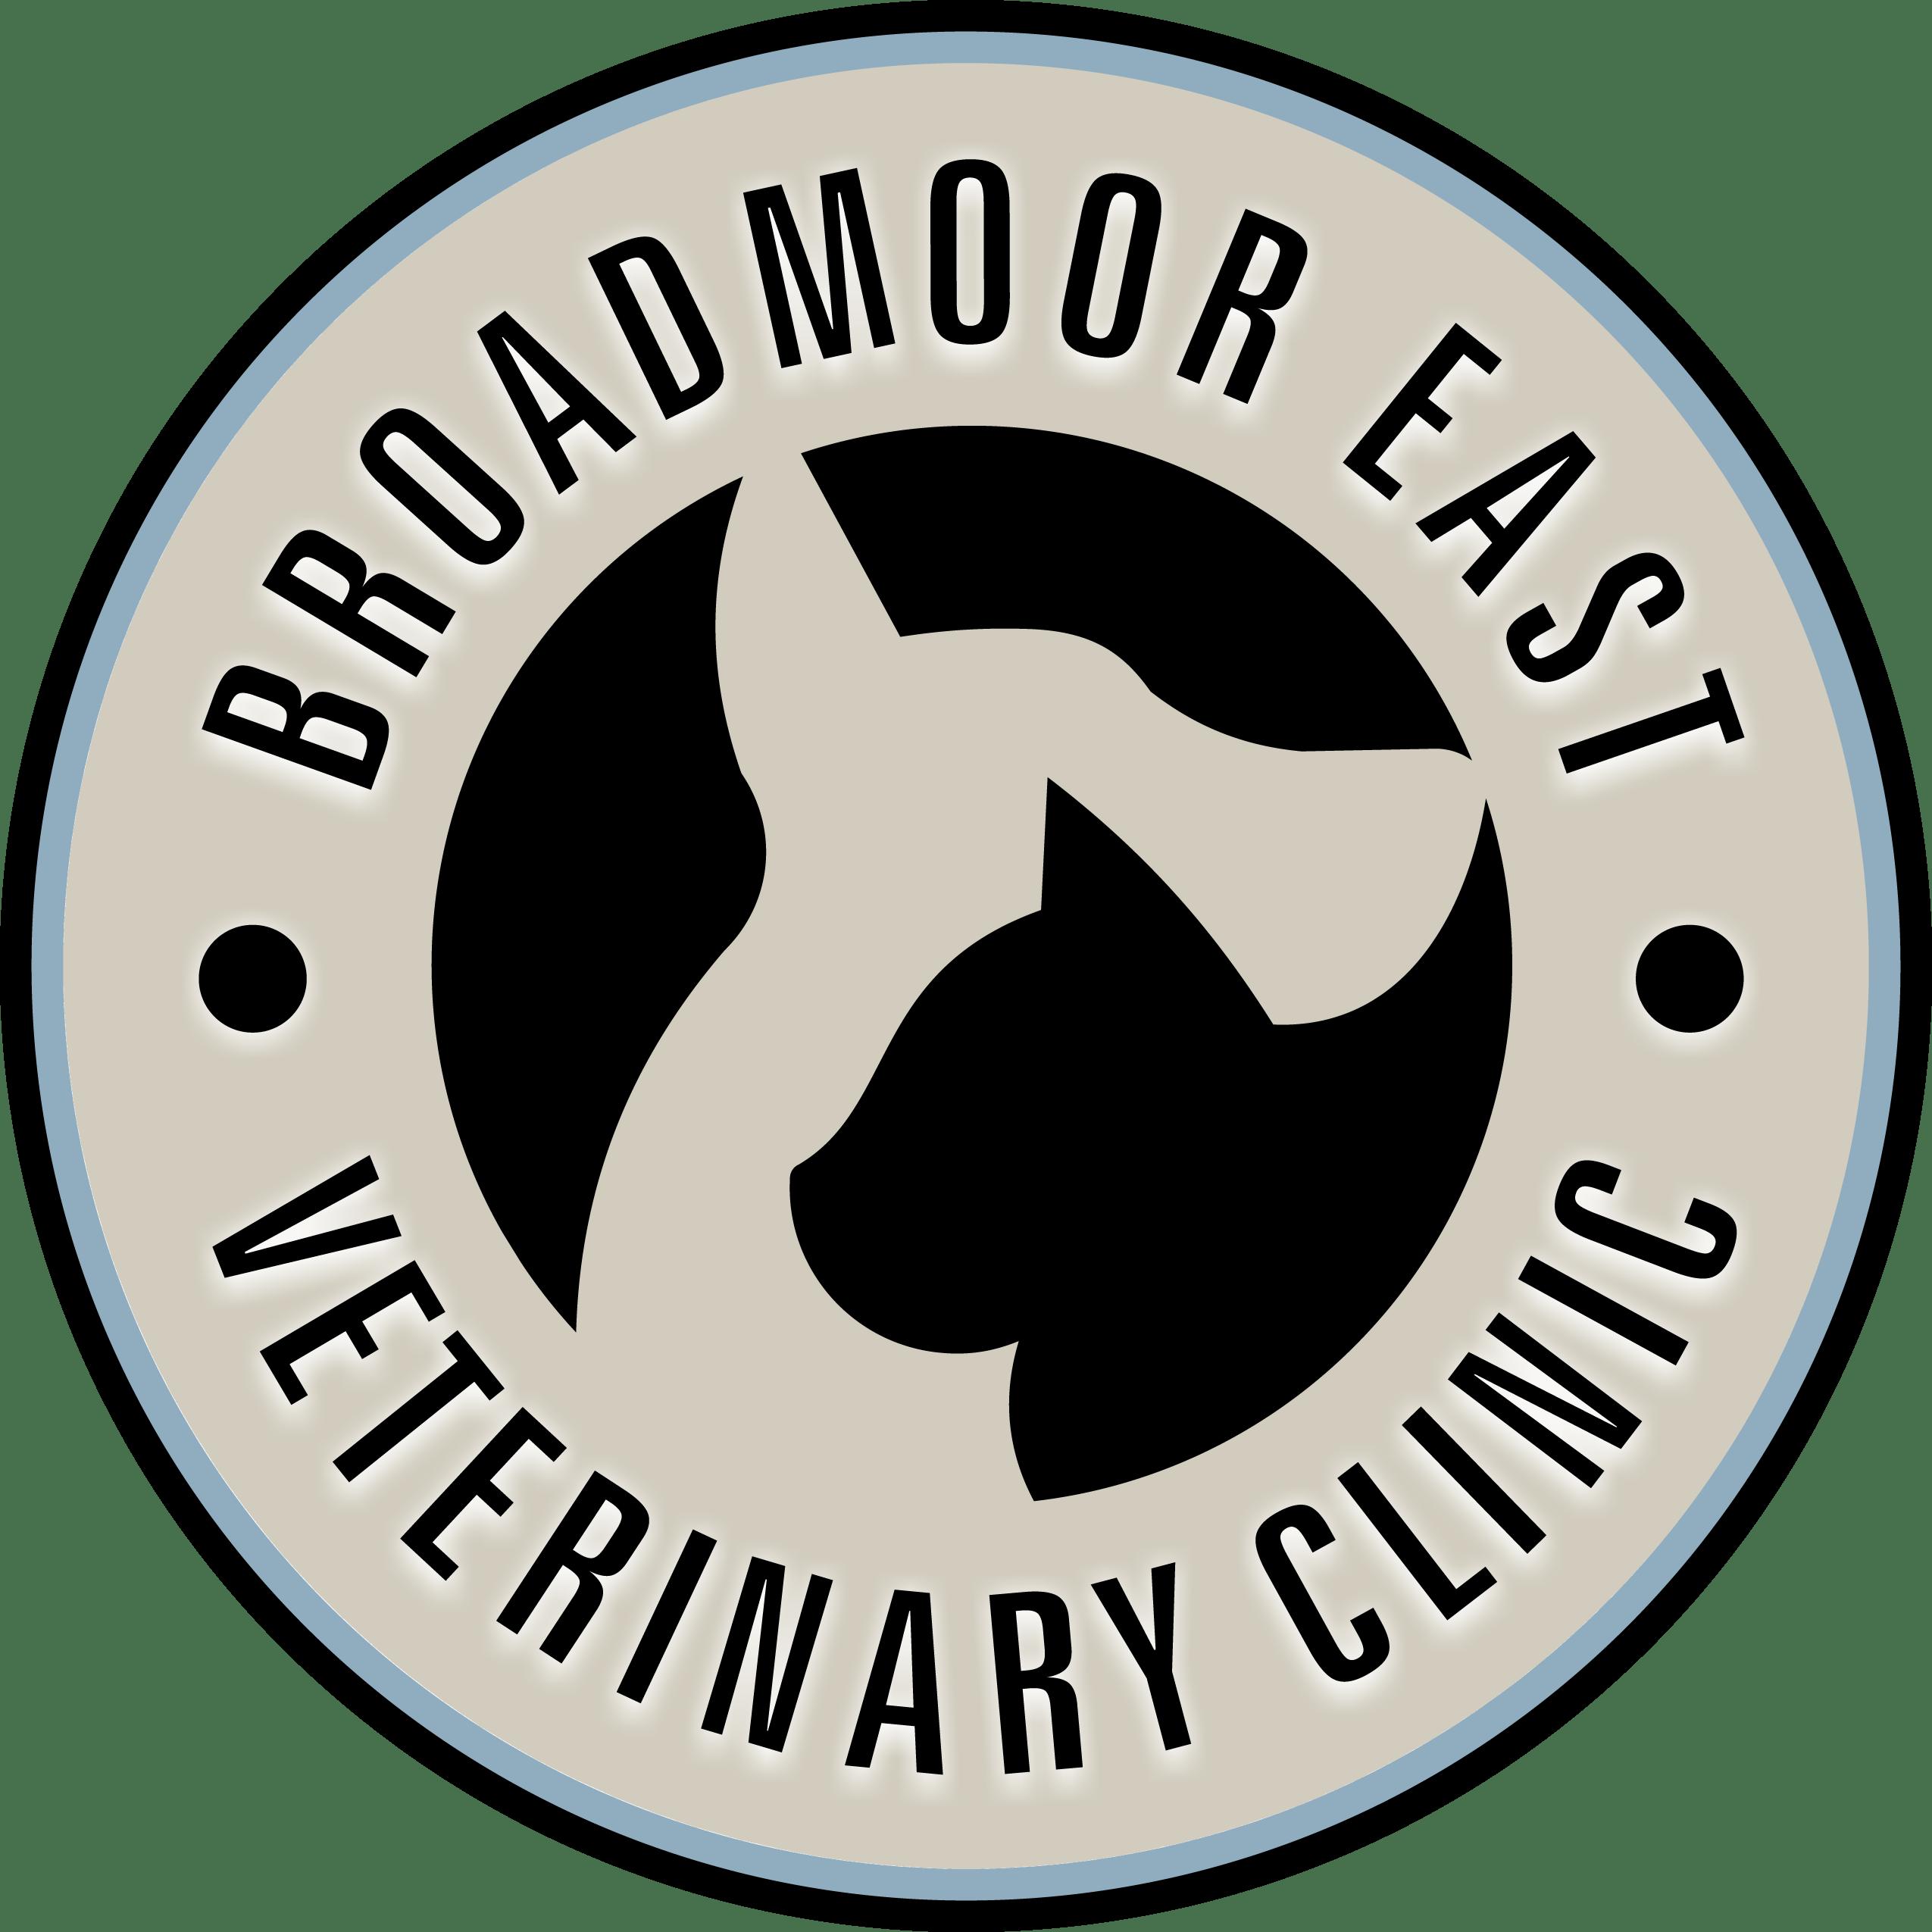 Broadmoor East Veterinary Clinic